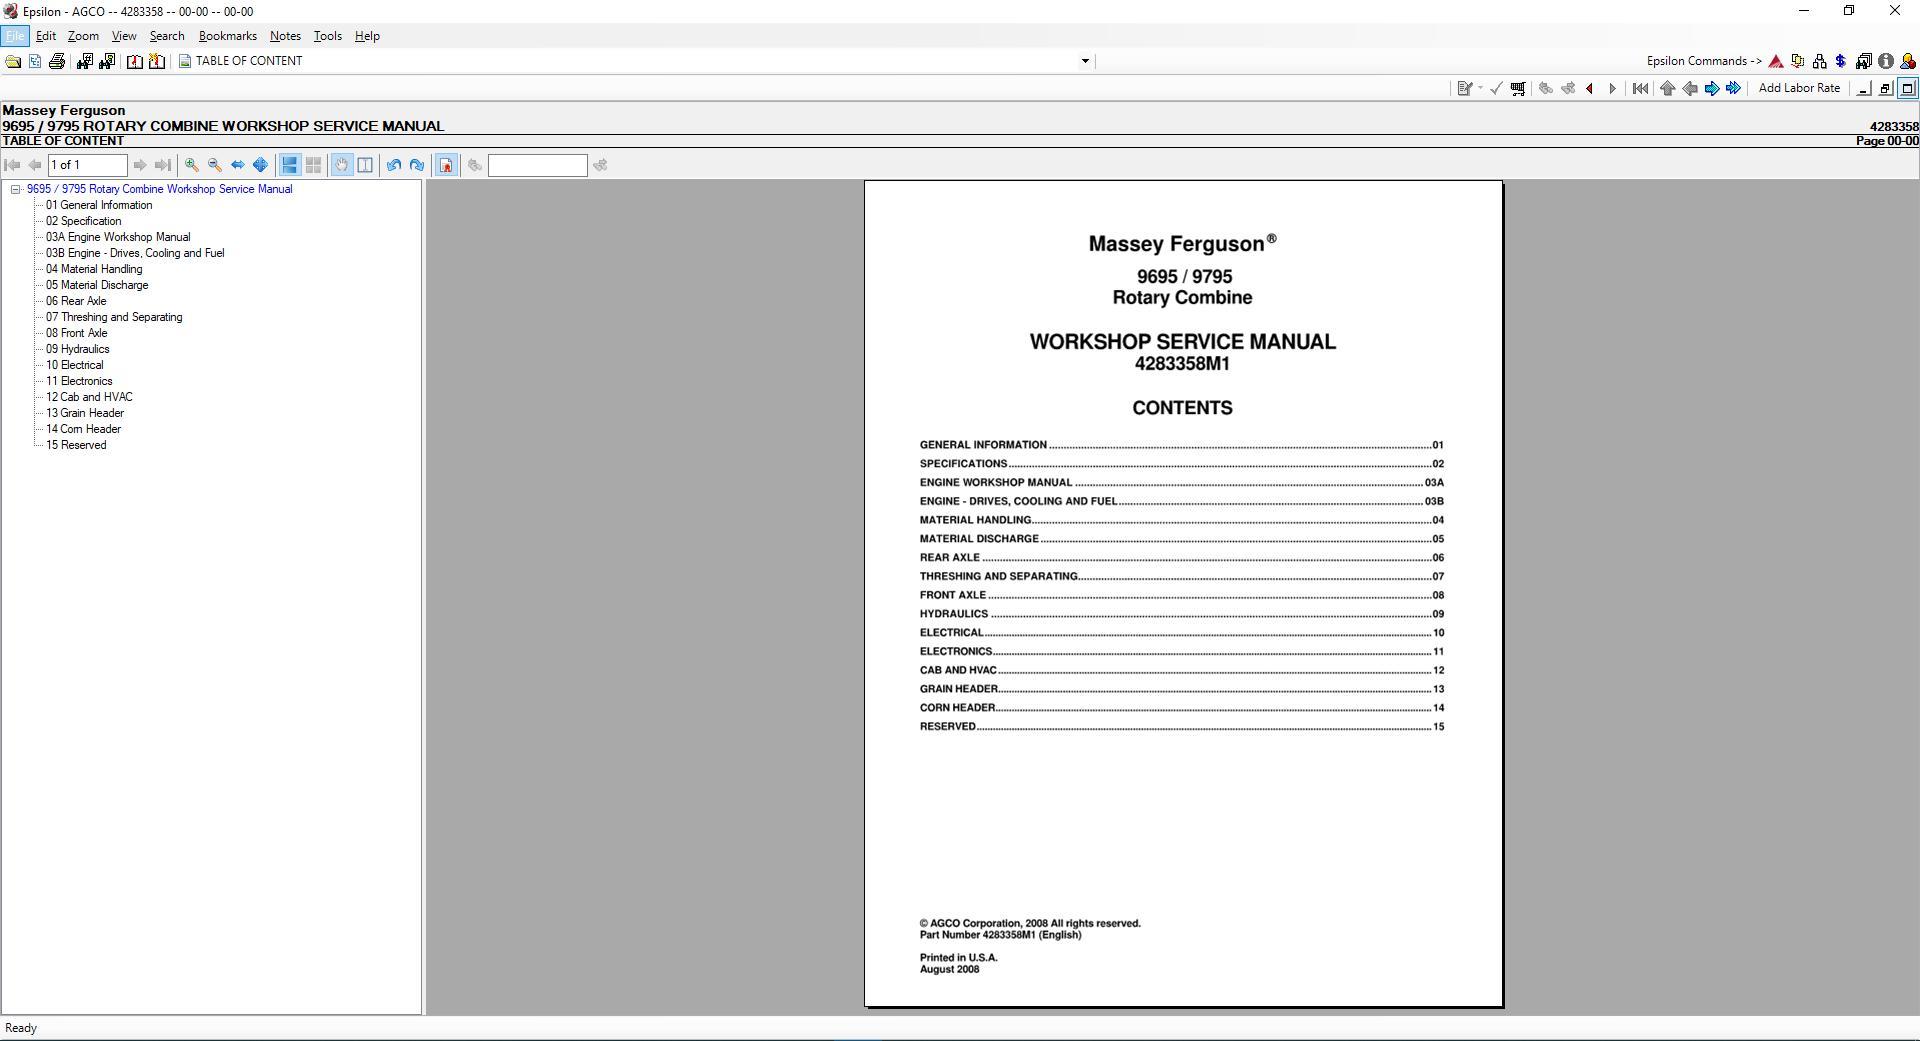 Massey_Ferguson_NA_AG_North_America_052019_Part_Book_Workshop_Service_Manuals6